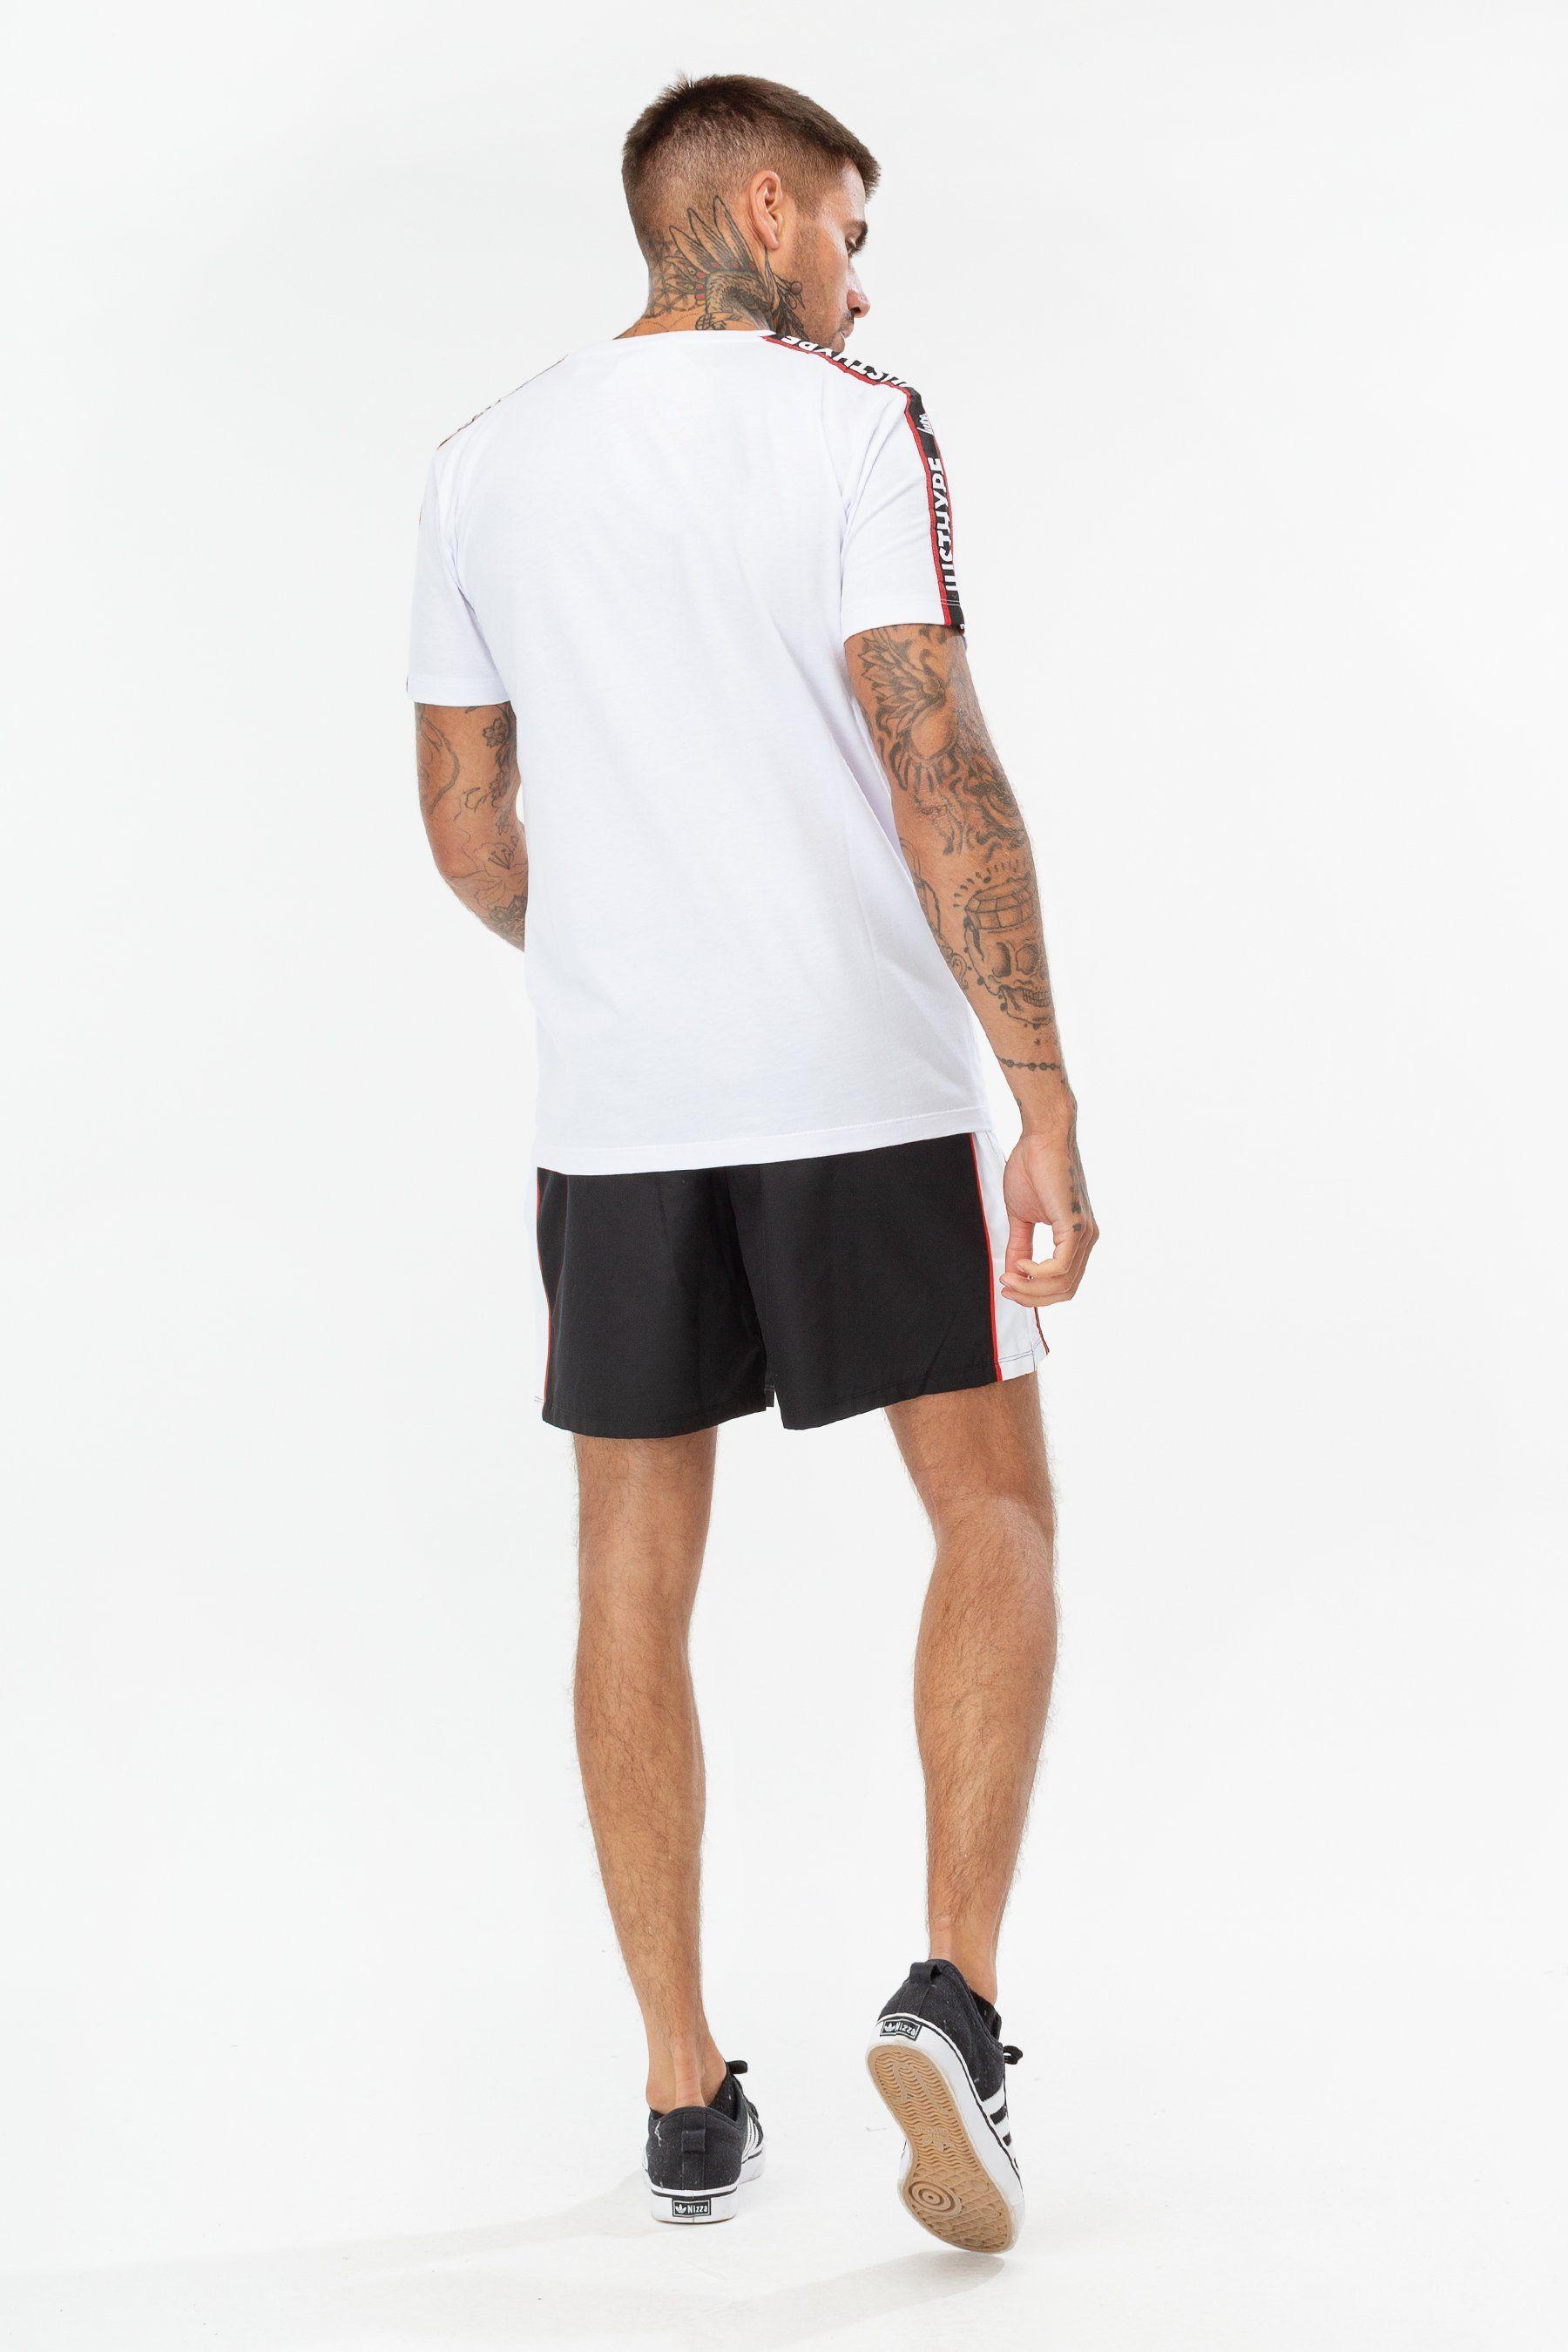 Hype White Jh Race Tape Mens T-Shirt S